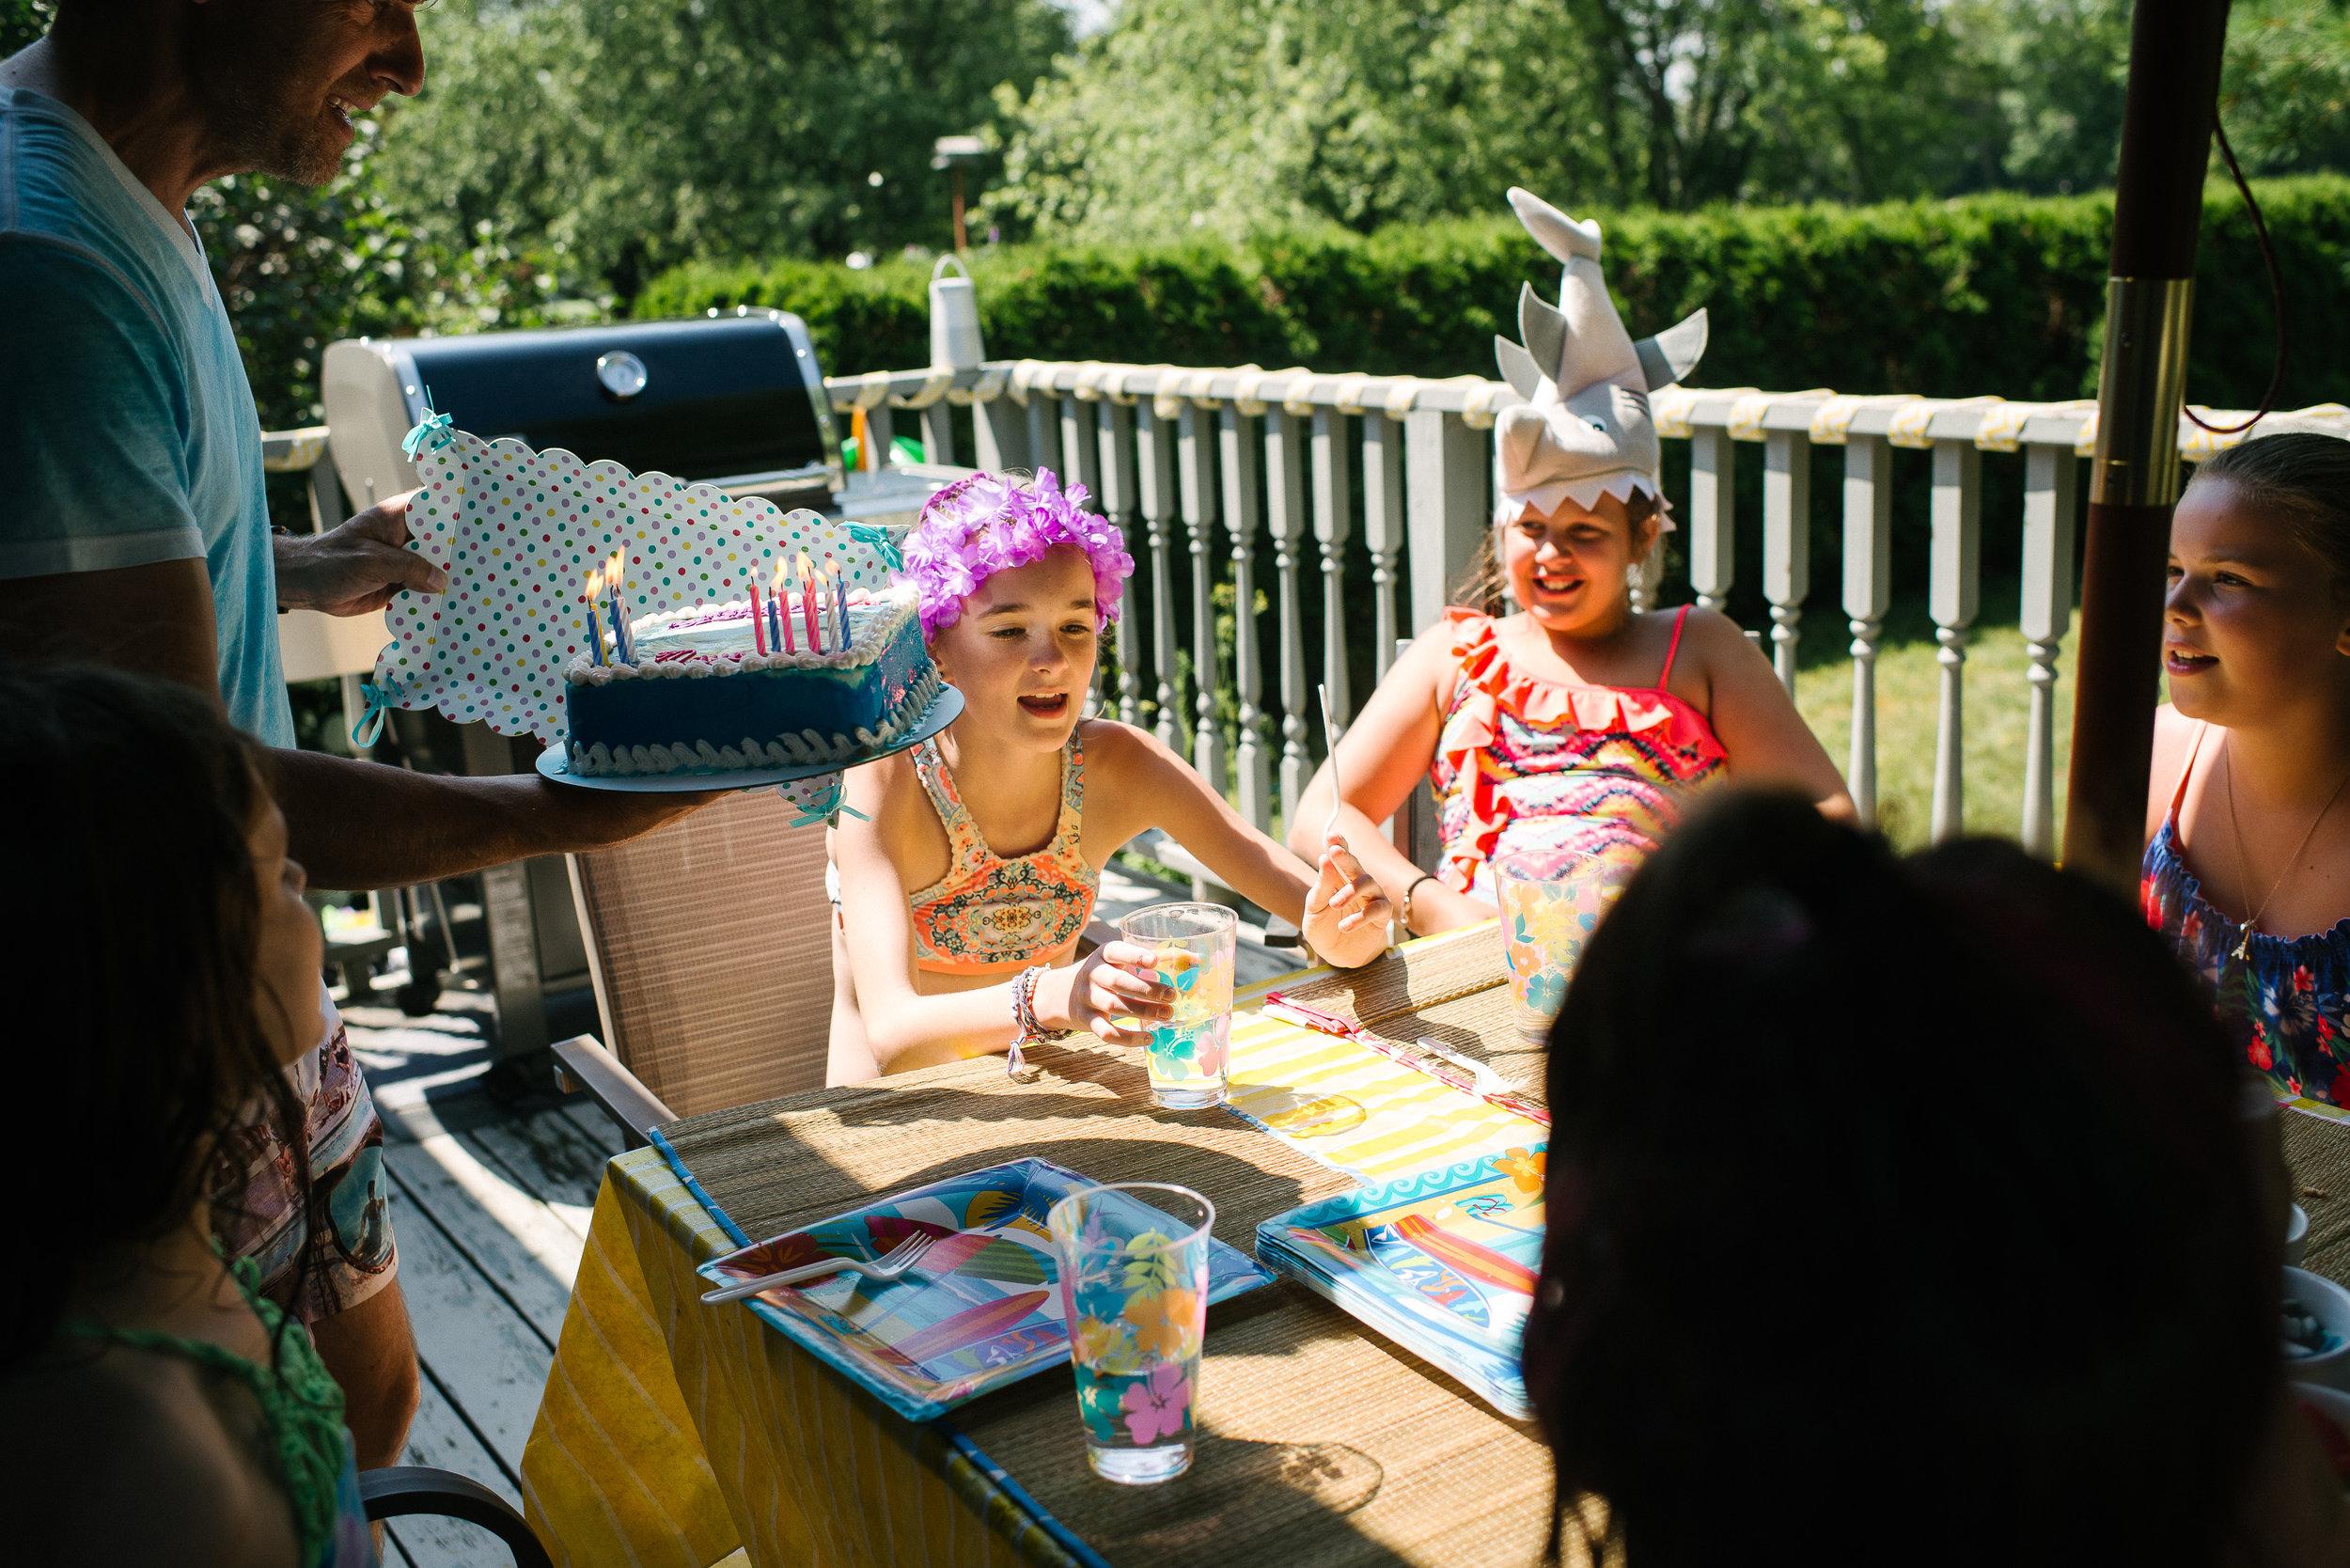 girl birthday party photography kingston-150909vm.jpg